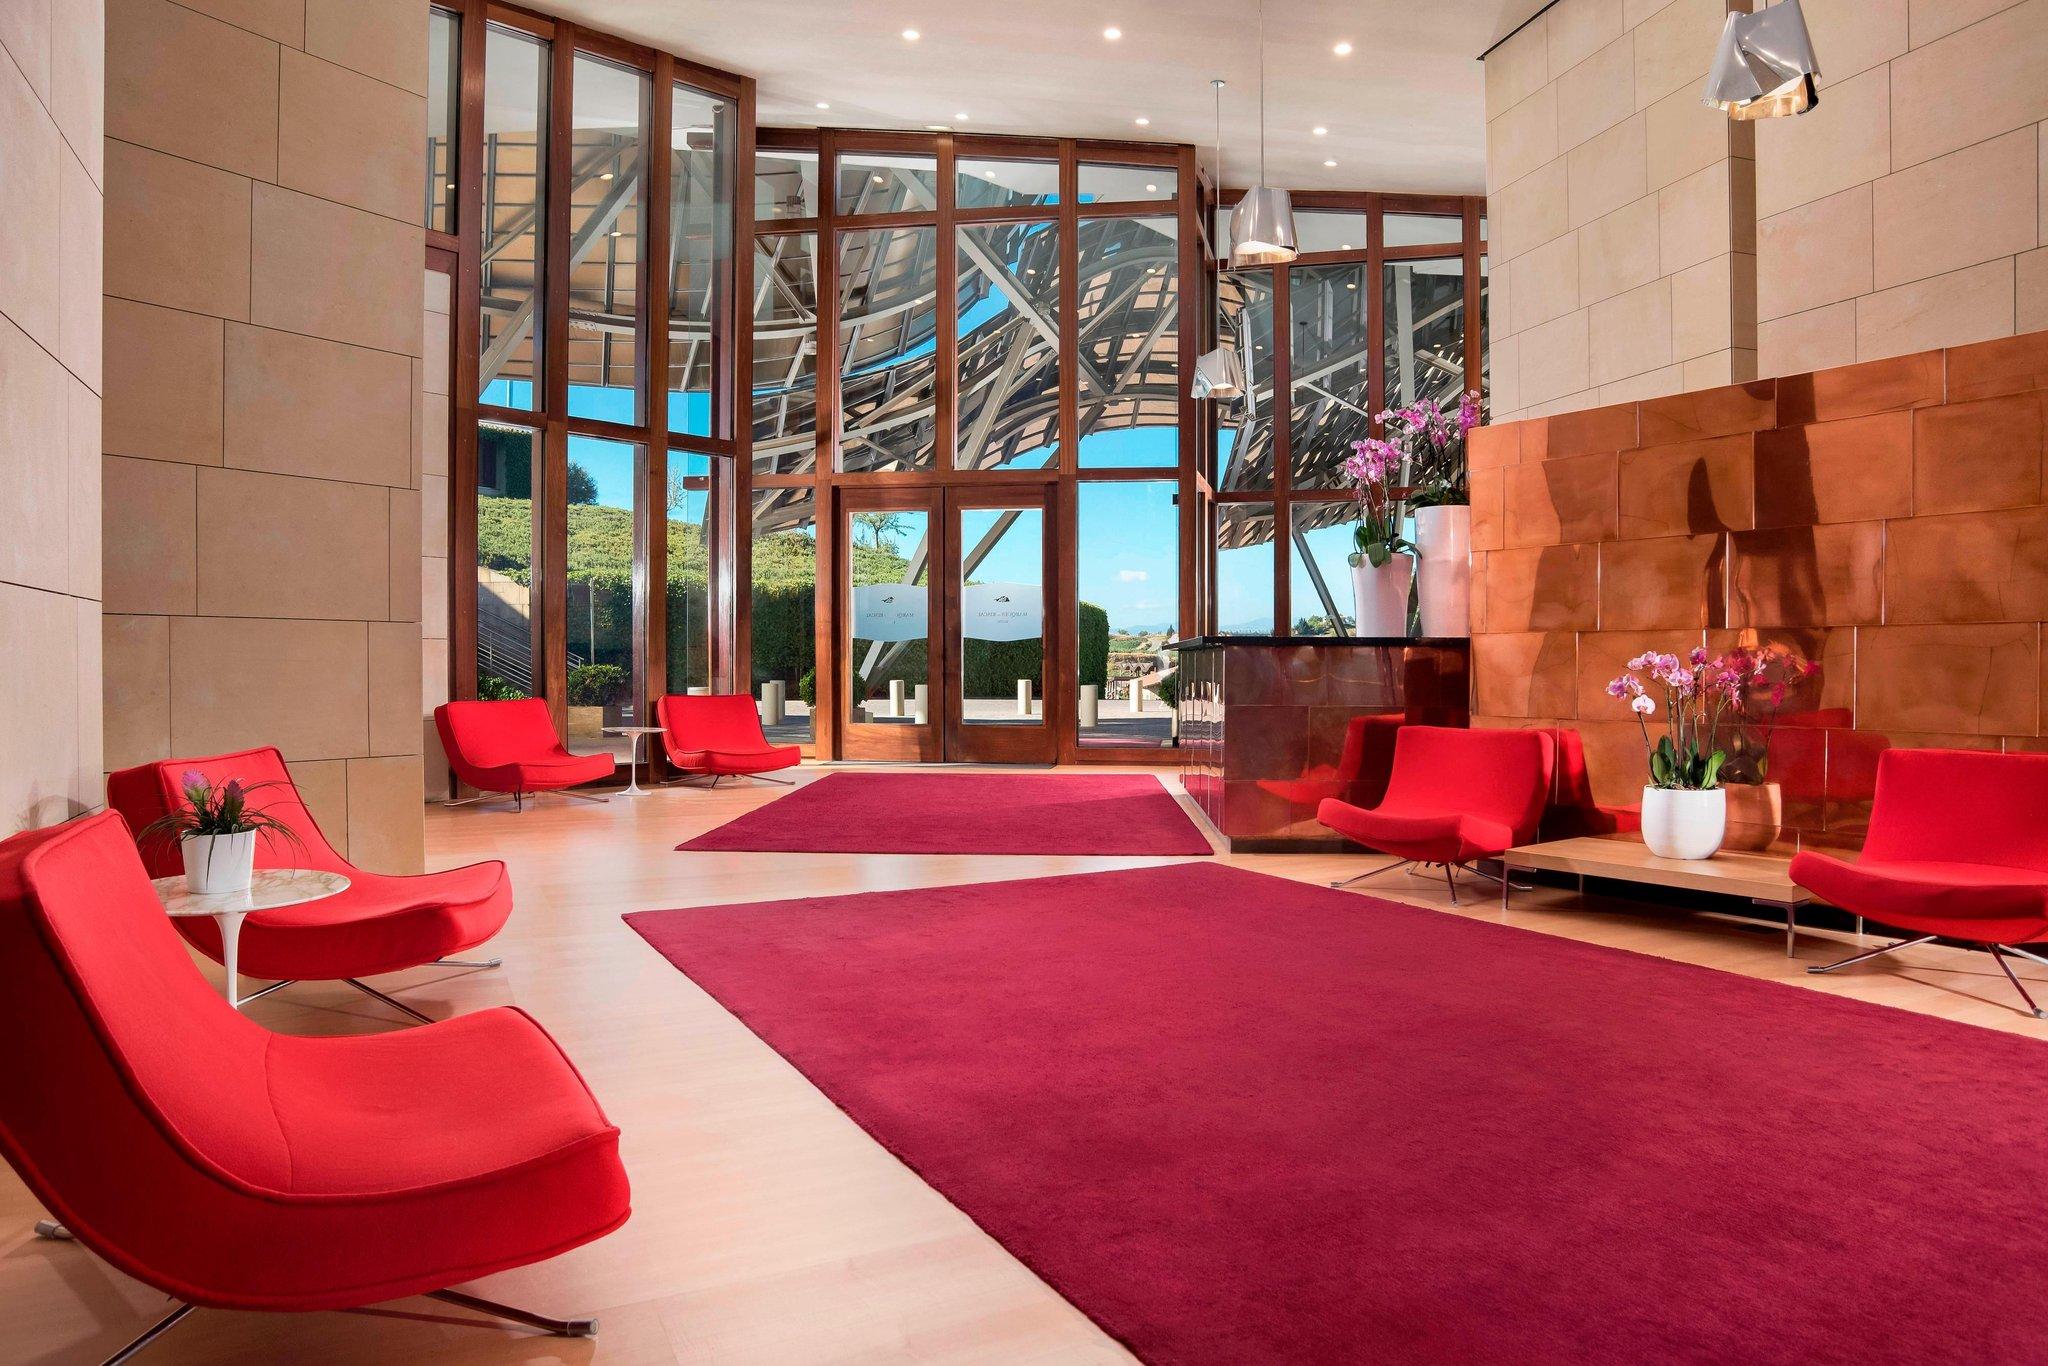 Hotel Marques de Riscal, a Luxury Coll